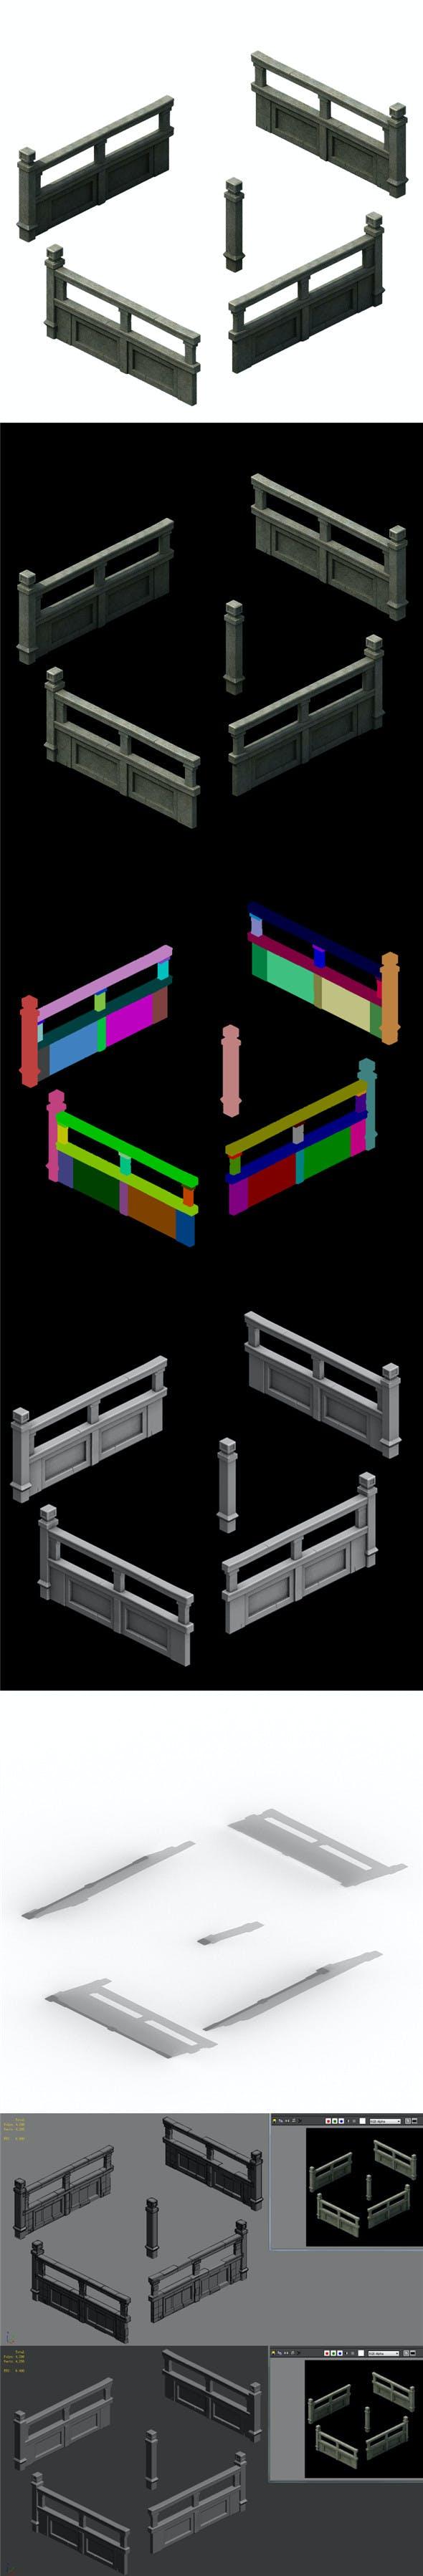 Ancient building accessories - railings 01 - 3DOcean Item for Sale